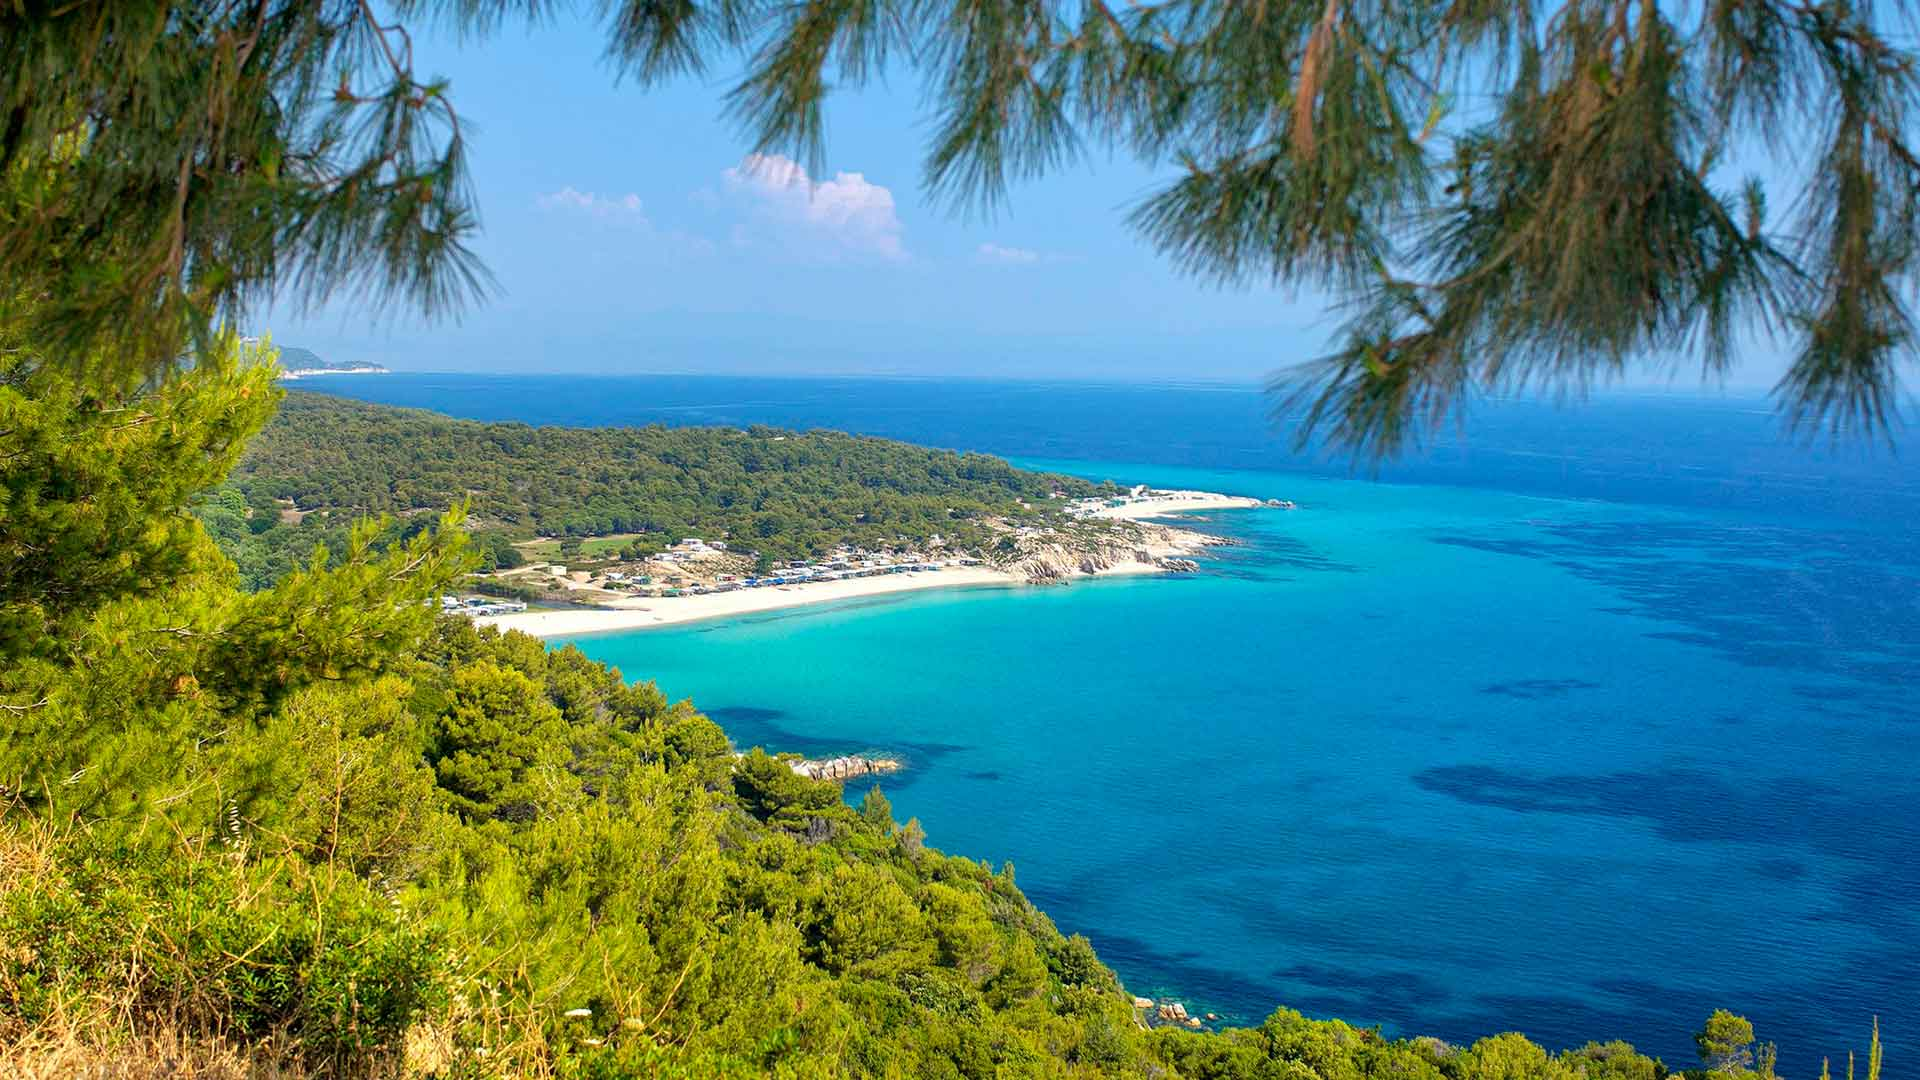 Hanioti Last minute Specijalne ponude apartmani u Grčkoj